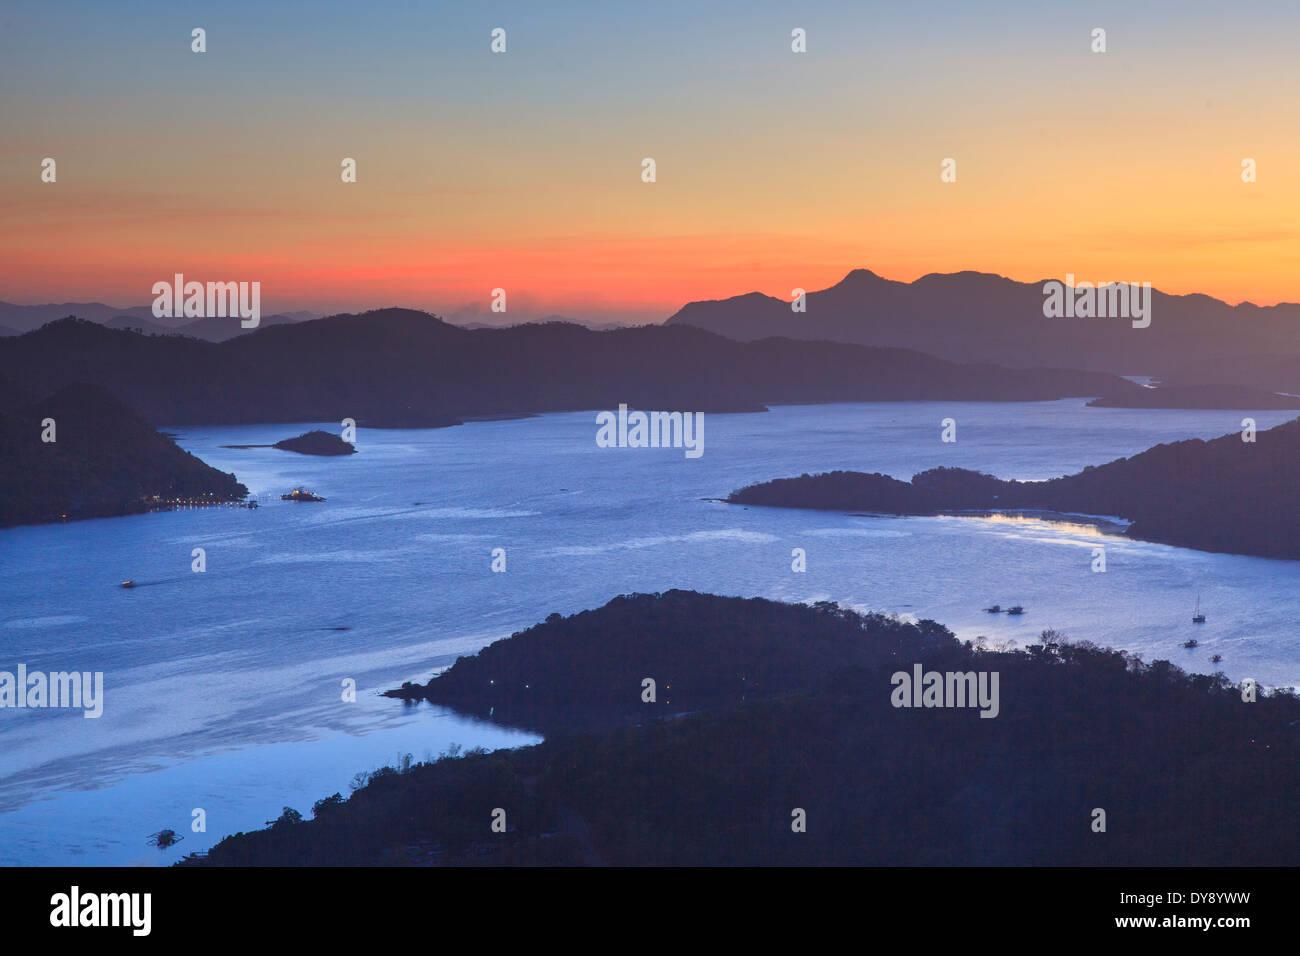 Philippines, Palawan, Coron Island, Coron Town - Stock Image